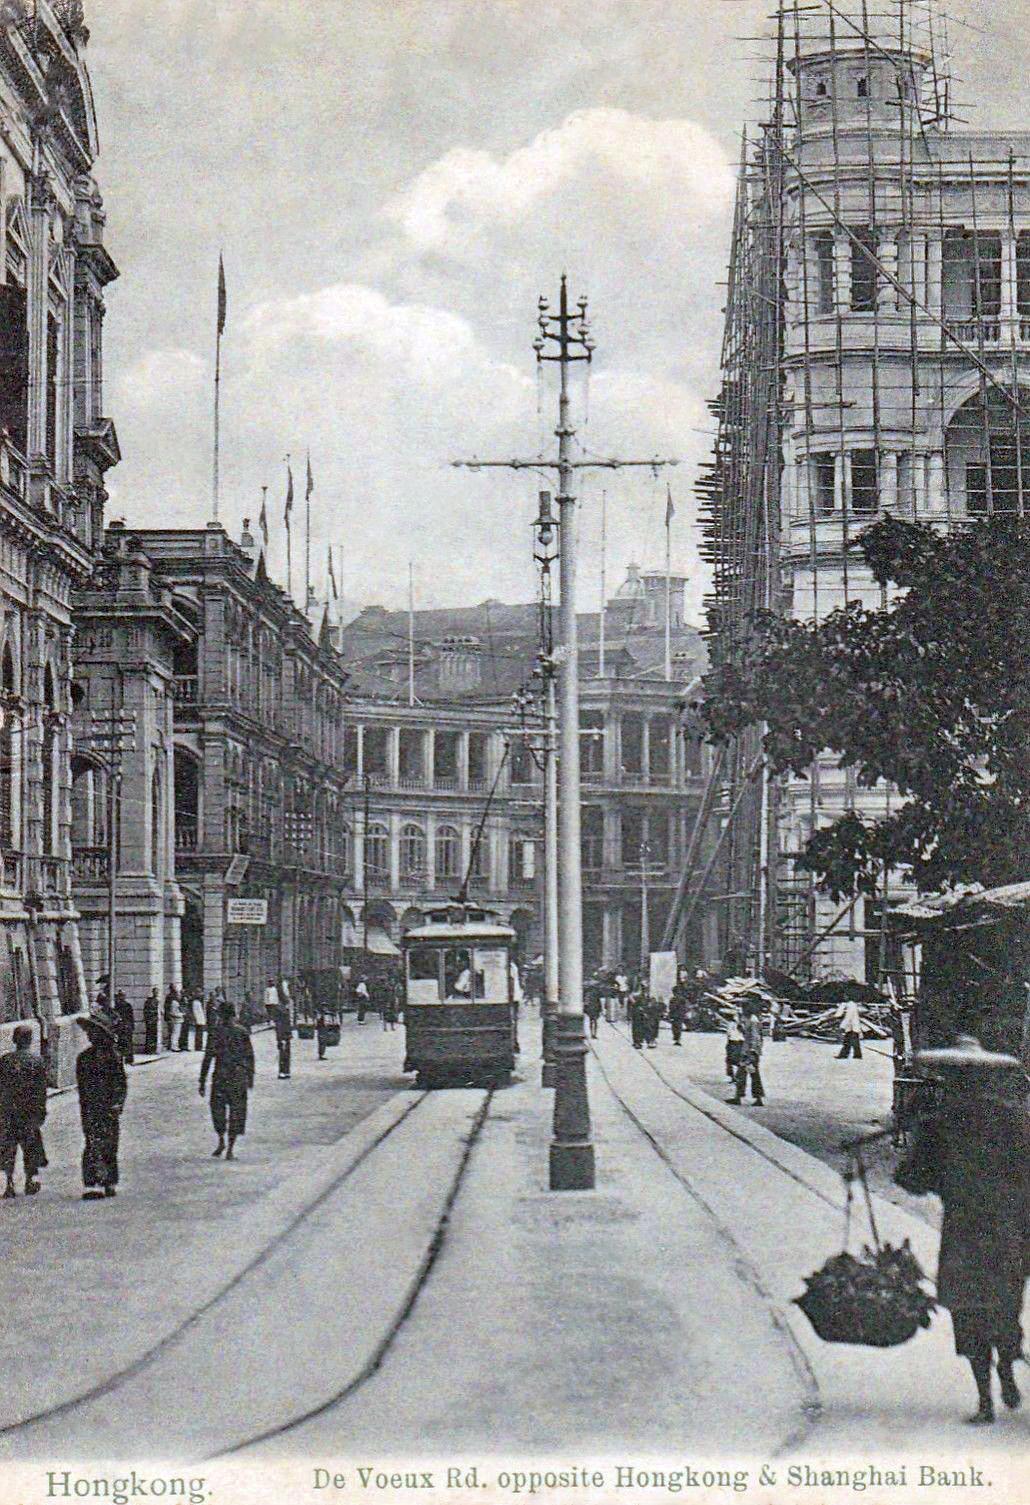 1fbcb595cb transpress nz: Hong Kong single deck tram circa 1910